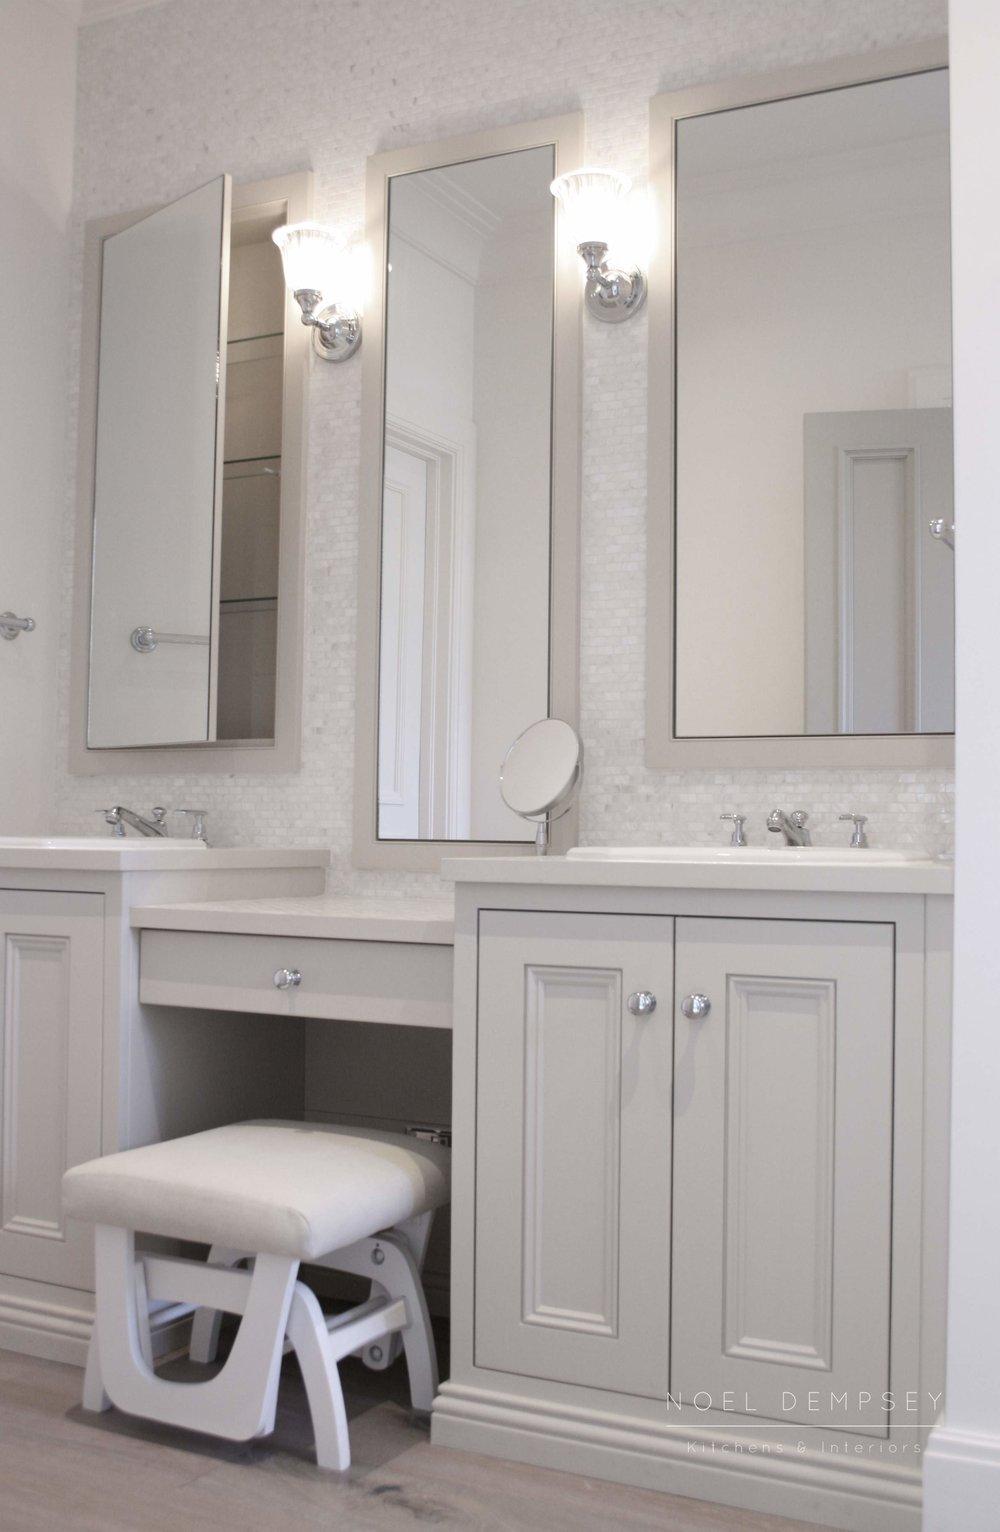 custom-vanity-units-ireland-4.jpg